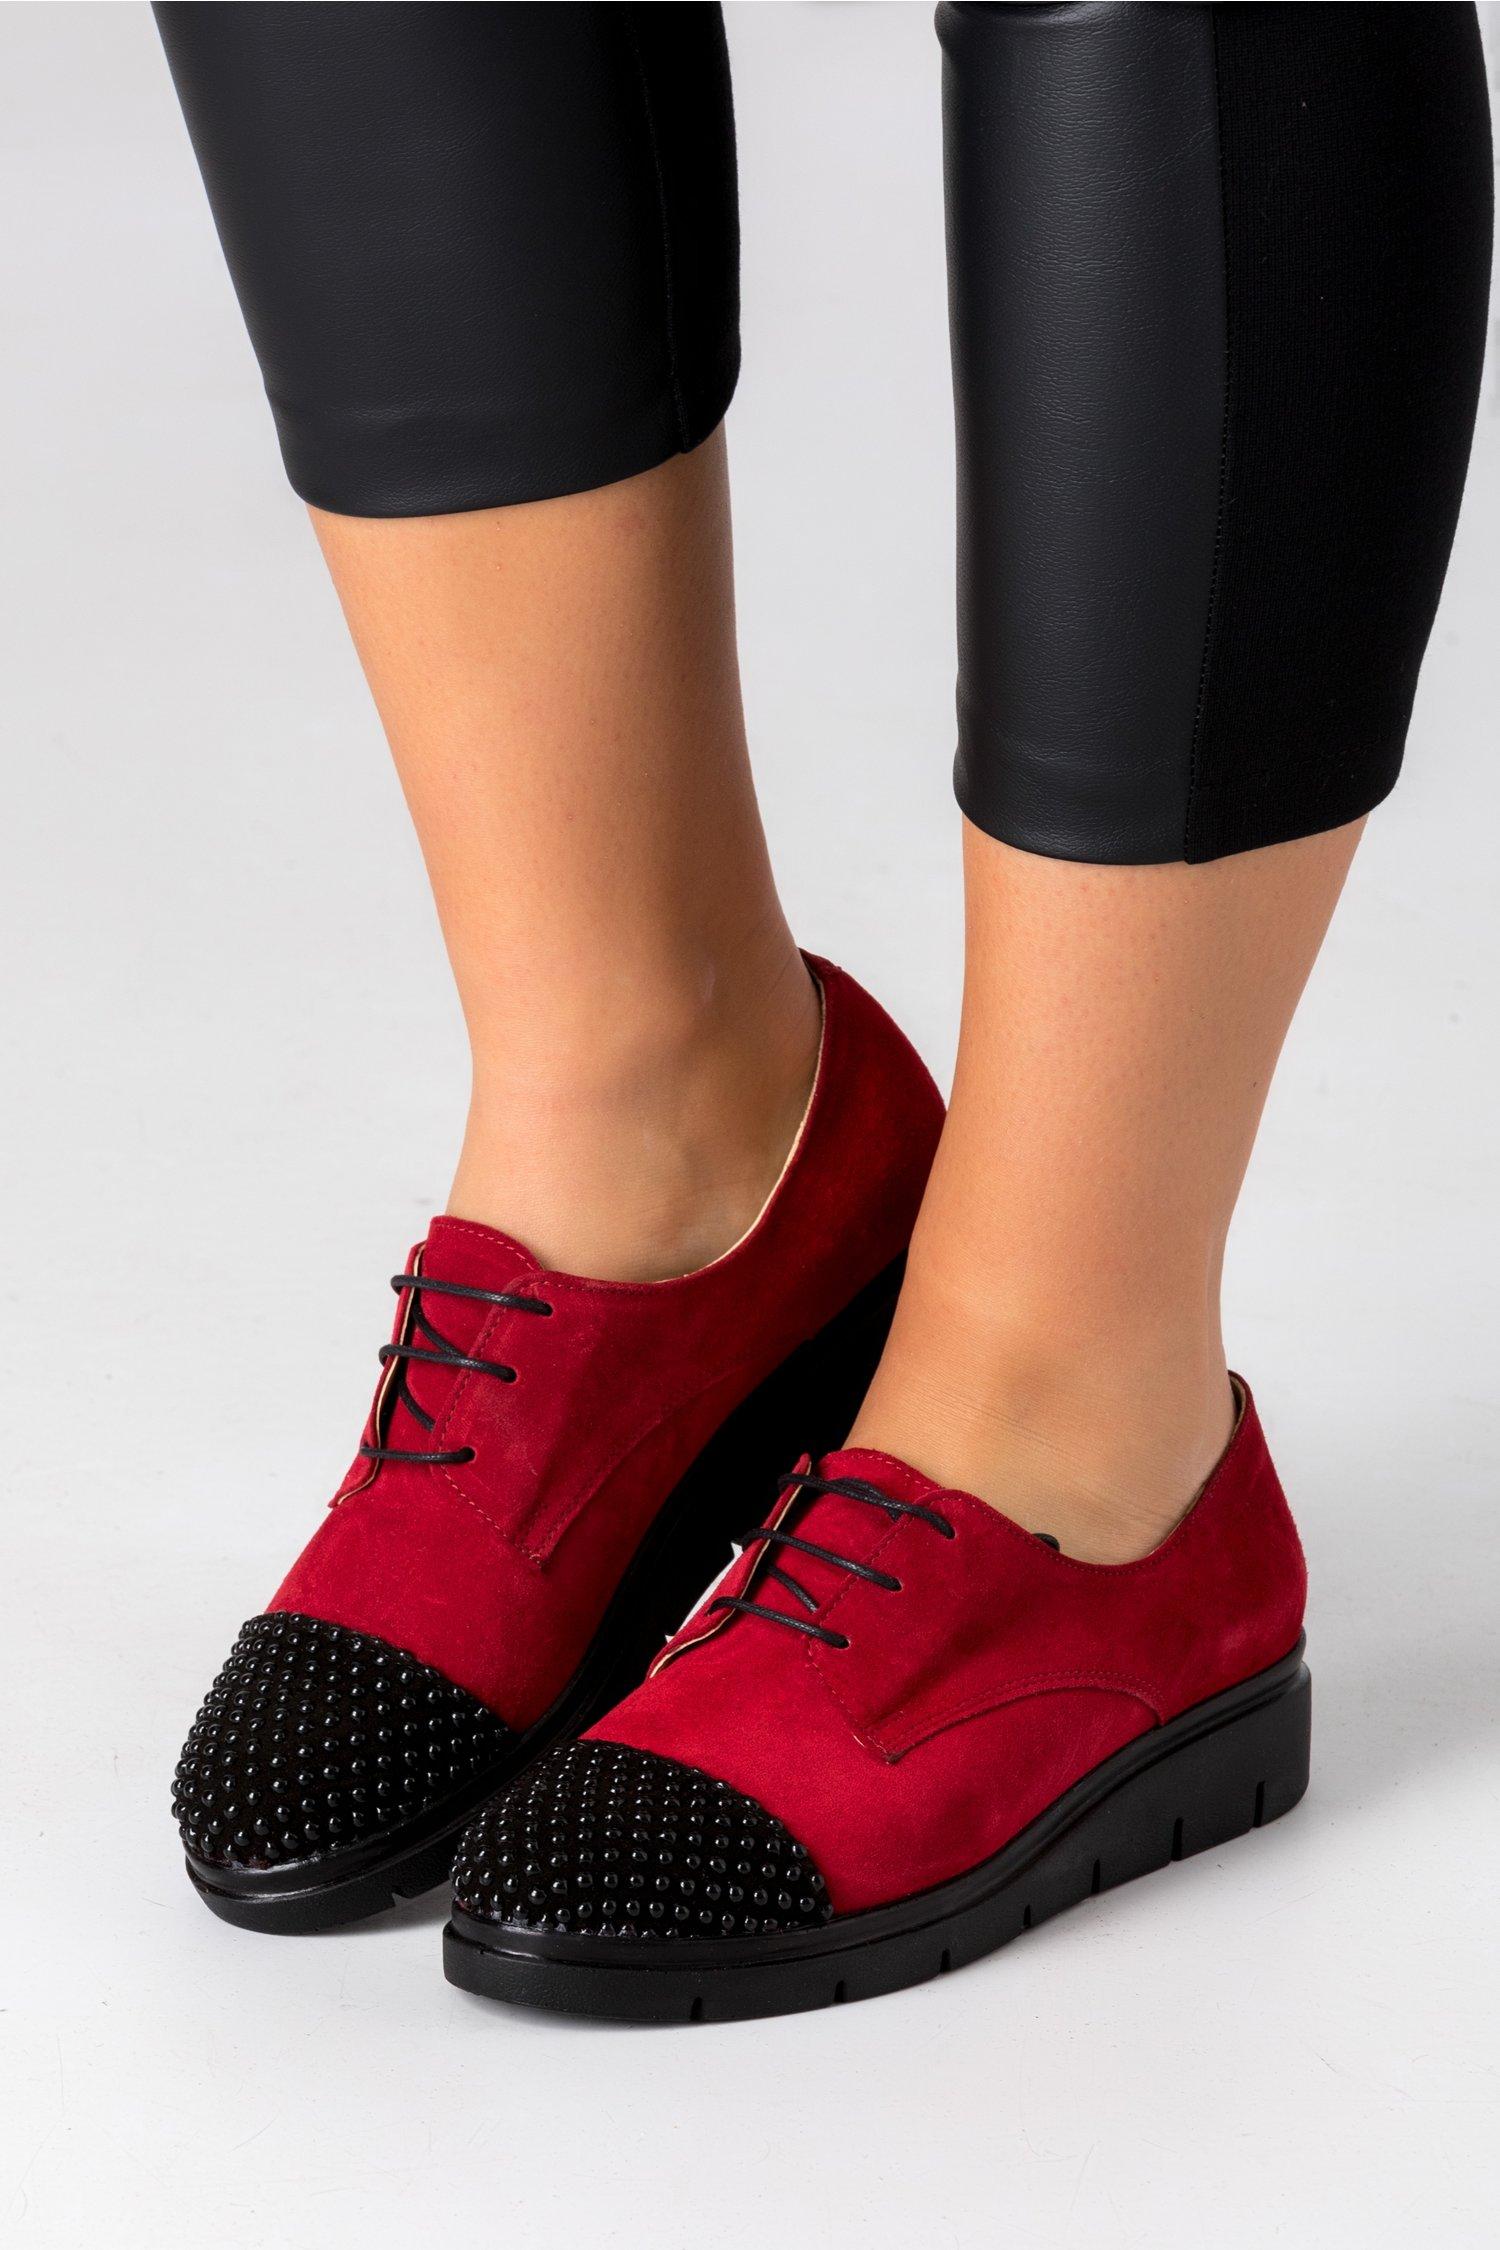 Pantofi Oxford bordo cu perlute aplicate la varf